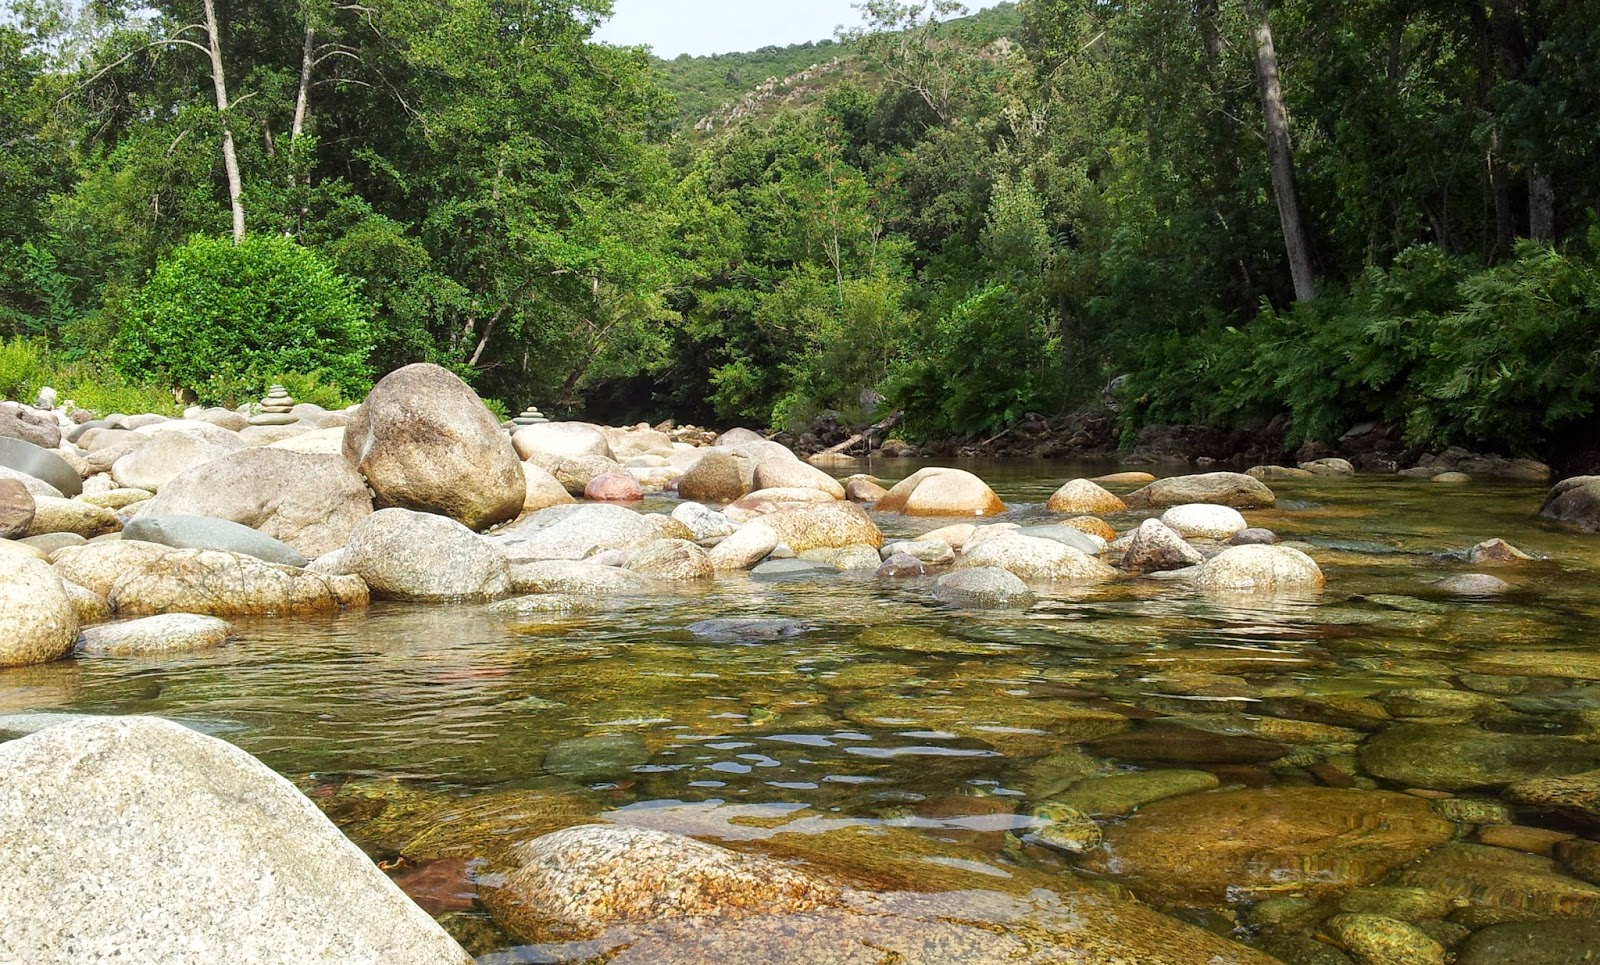 "<img src=""Golo.jpg"" alt=""Fluss Golo auf Korsika in der Nähe von Francardo"">"